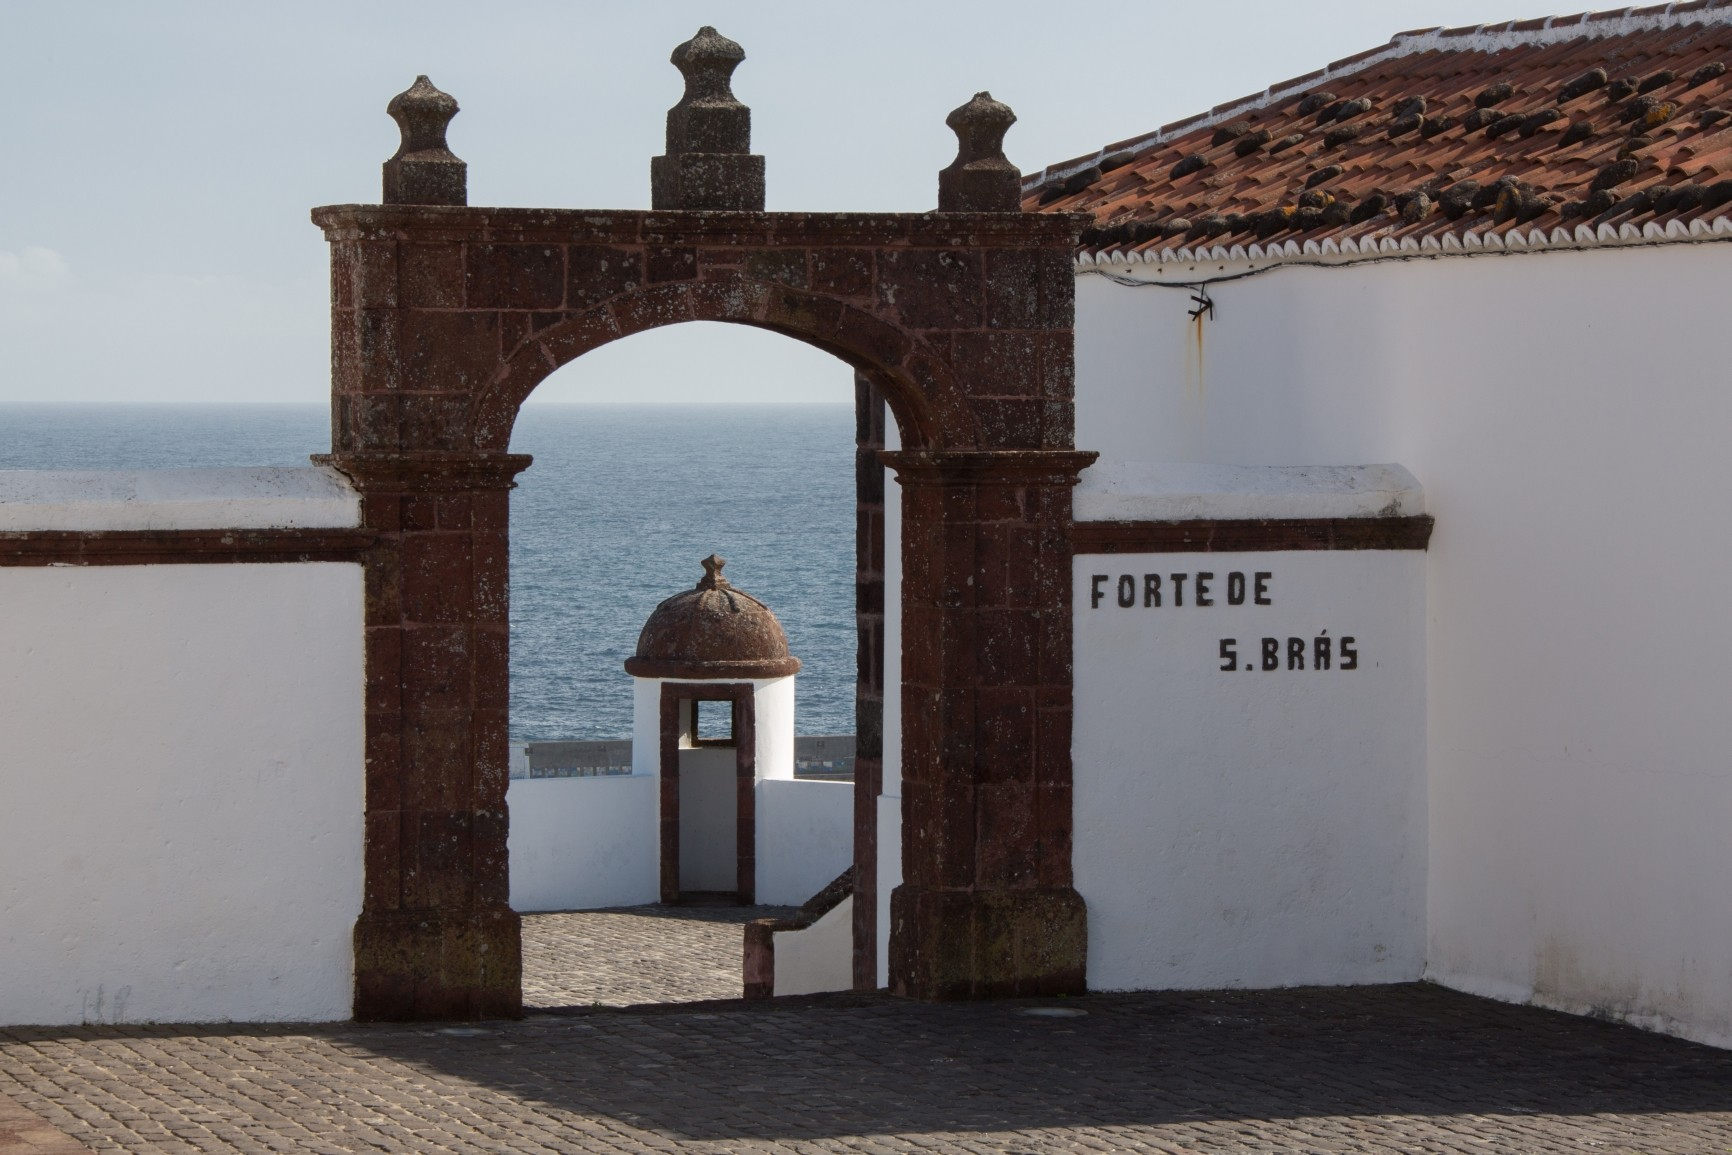 Santa Maria - Vila do Porto - Forte de Sao Bras